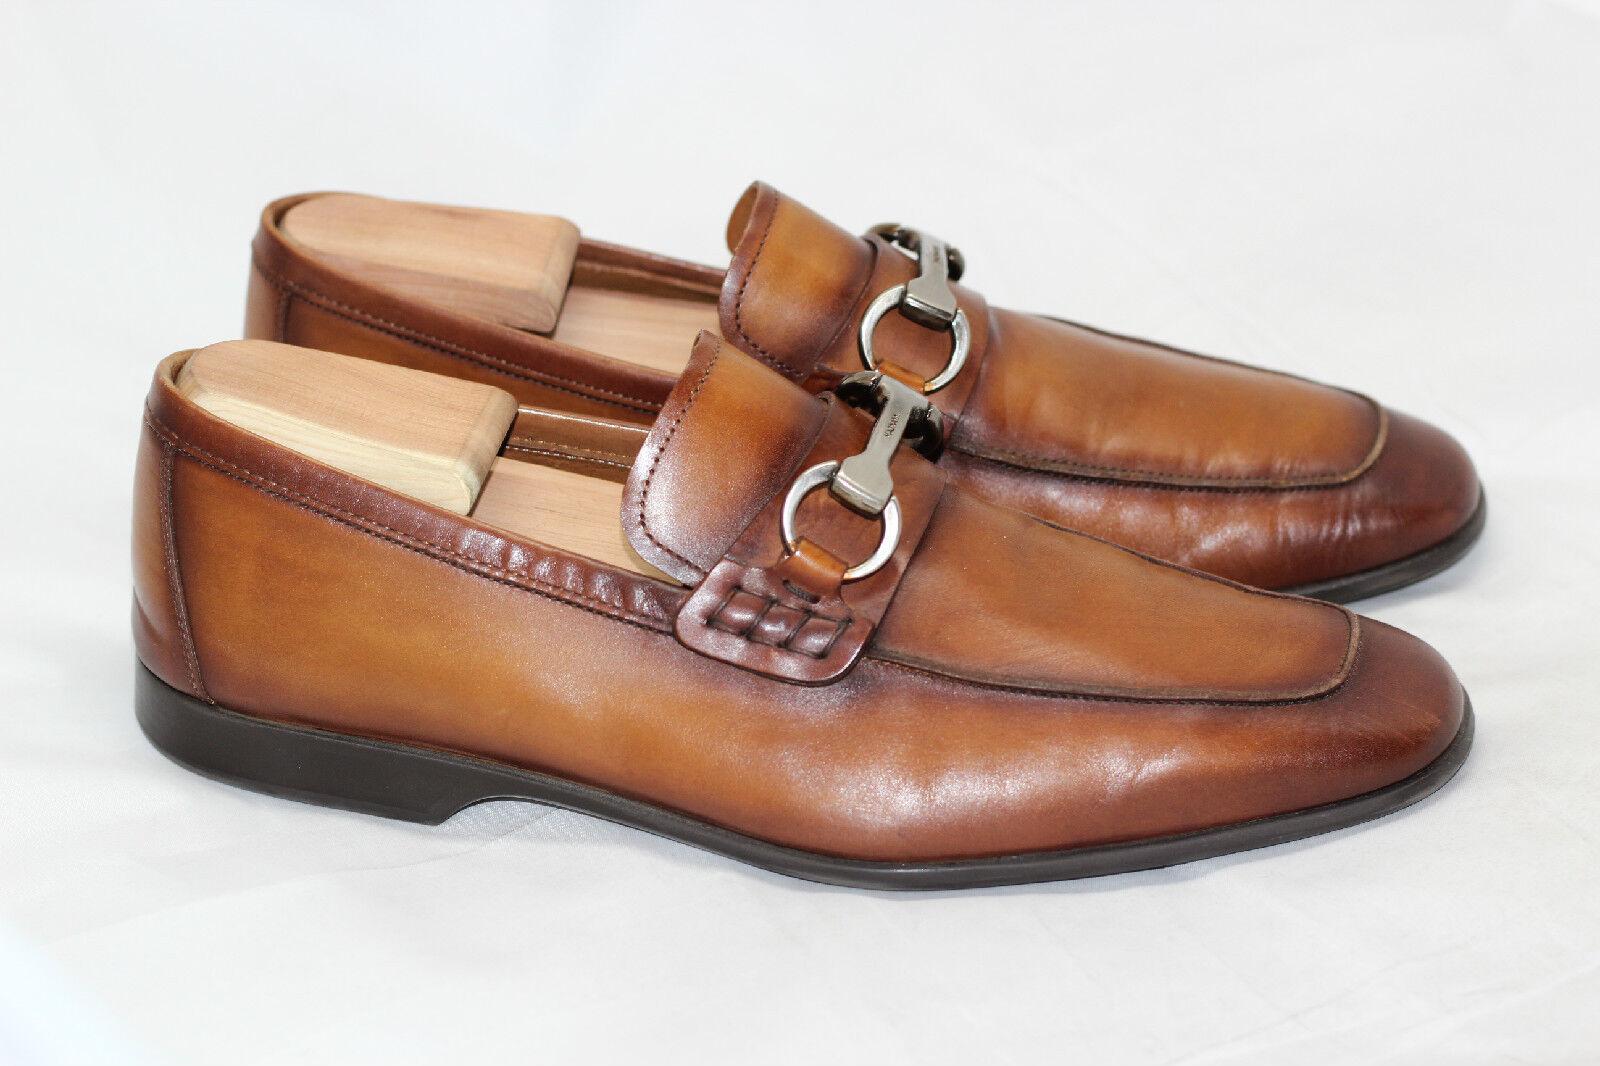 Mens Magnanni Rafa II Bit Loafer shoes Slip On - Cognac Brown - 8M - 18456 (T65)